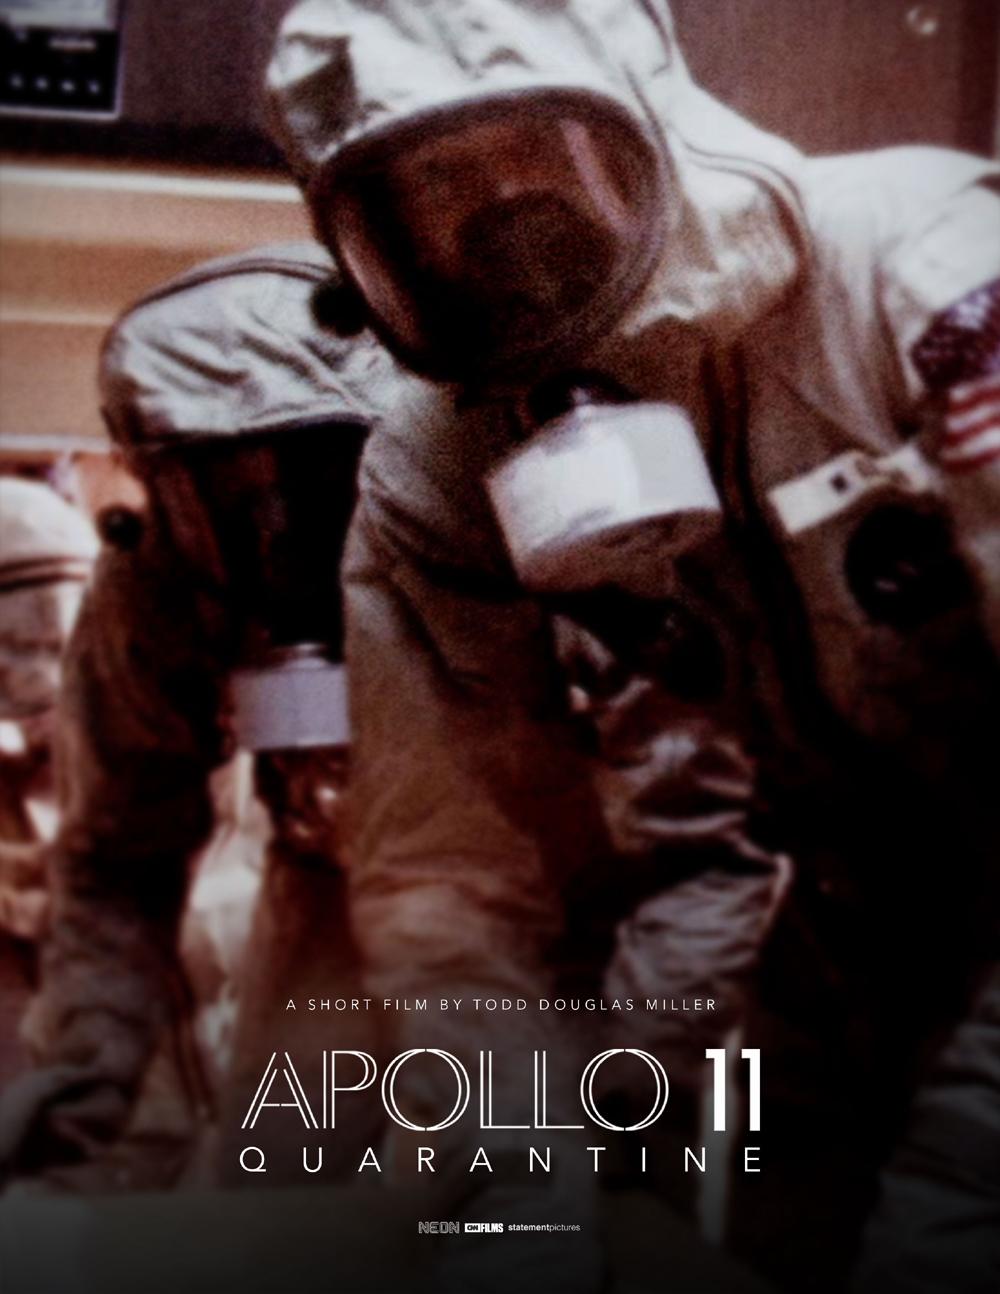 Póster de Apollo 11 Quarantine, corto de Todd Douglas Miller (2021).